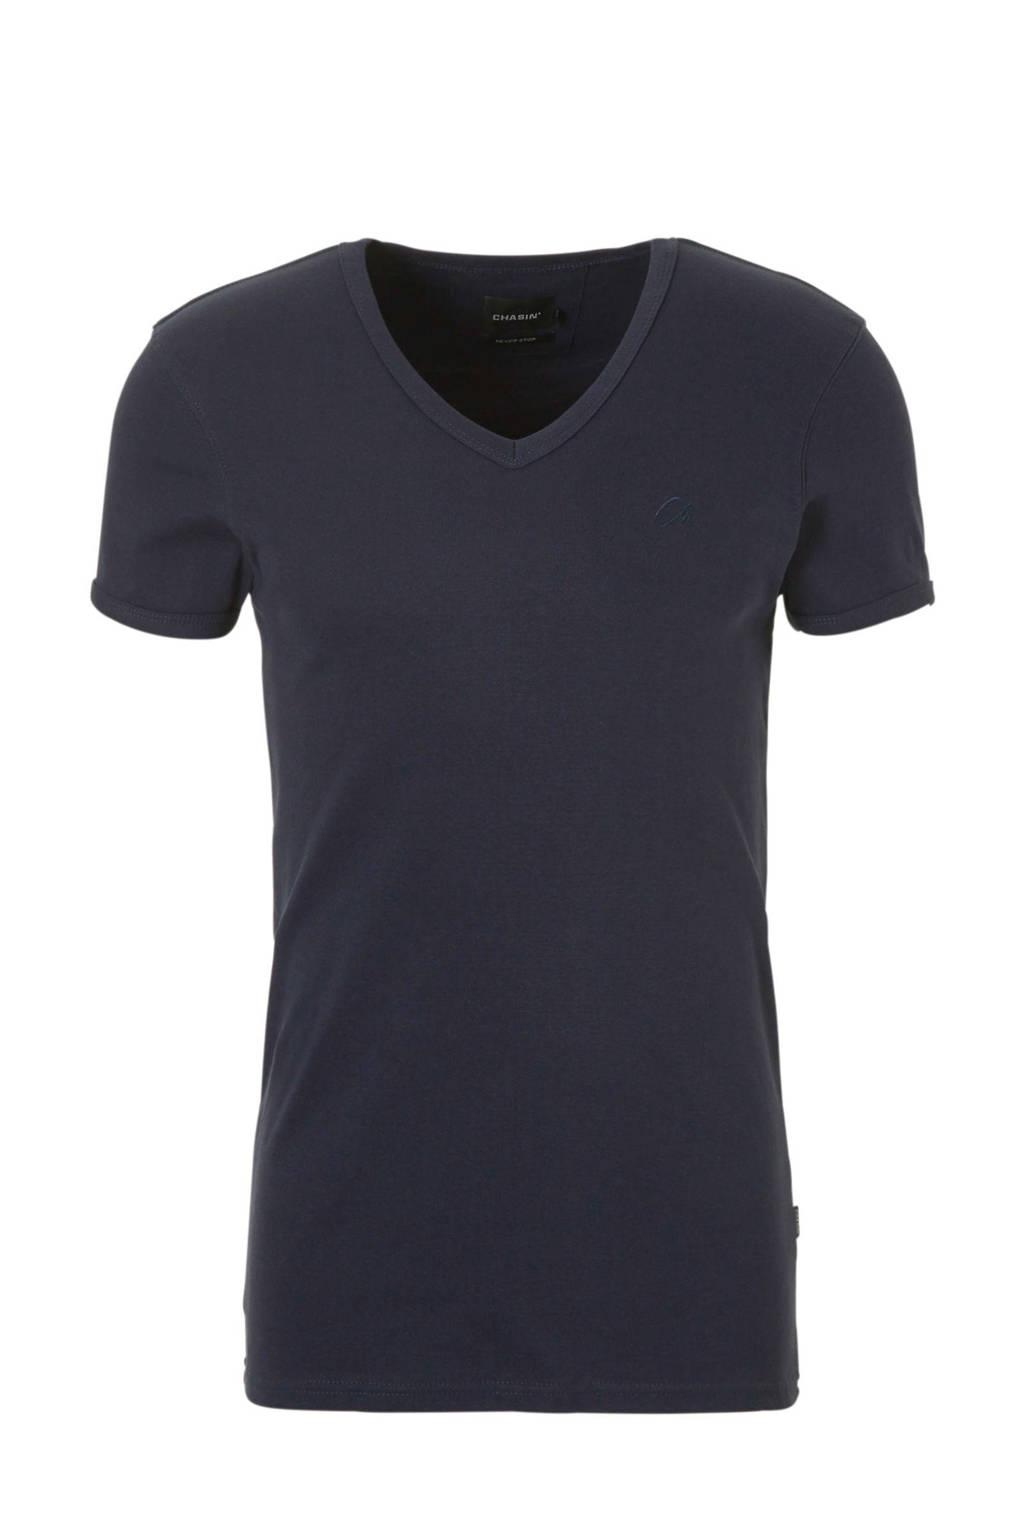 Chasin' slim fit T-shirt marine, Marine